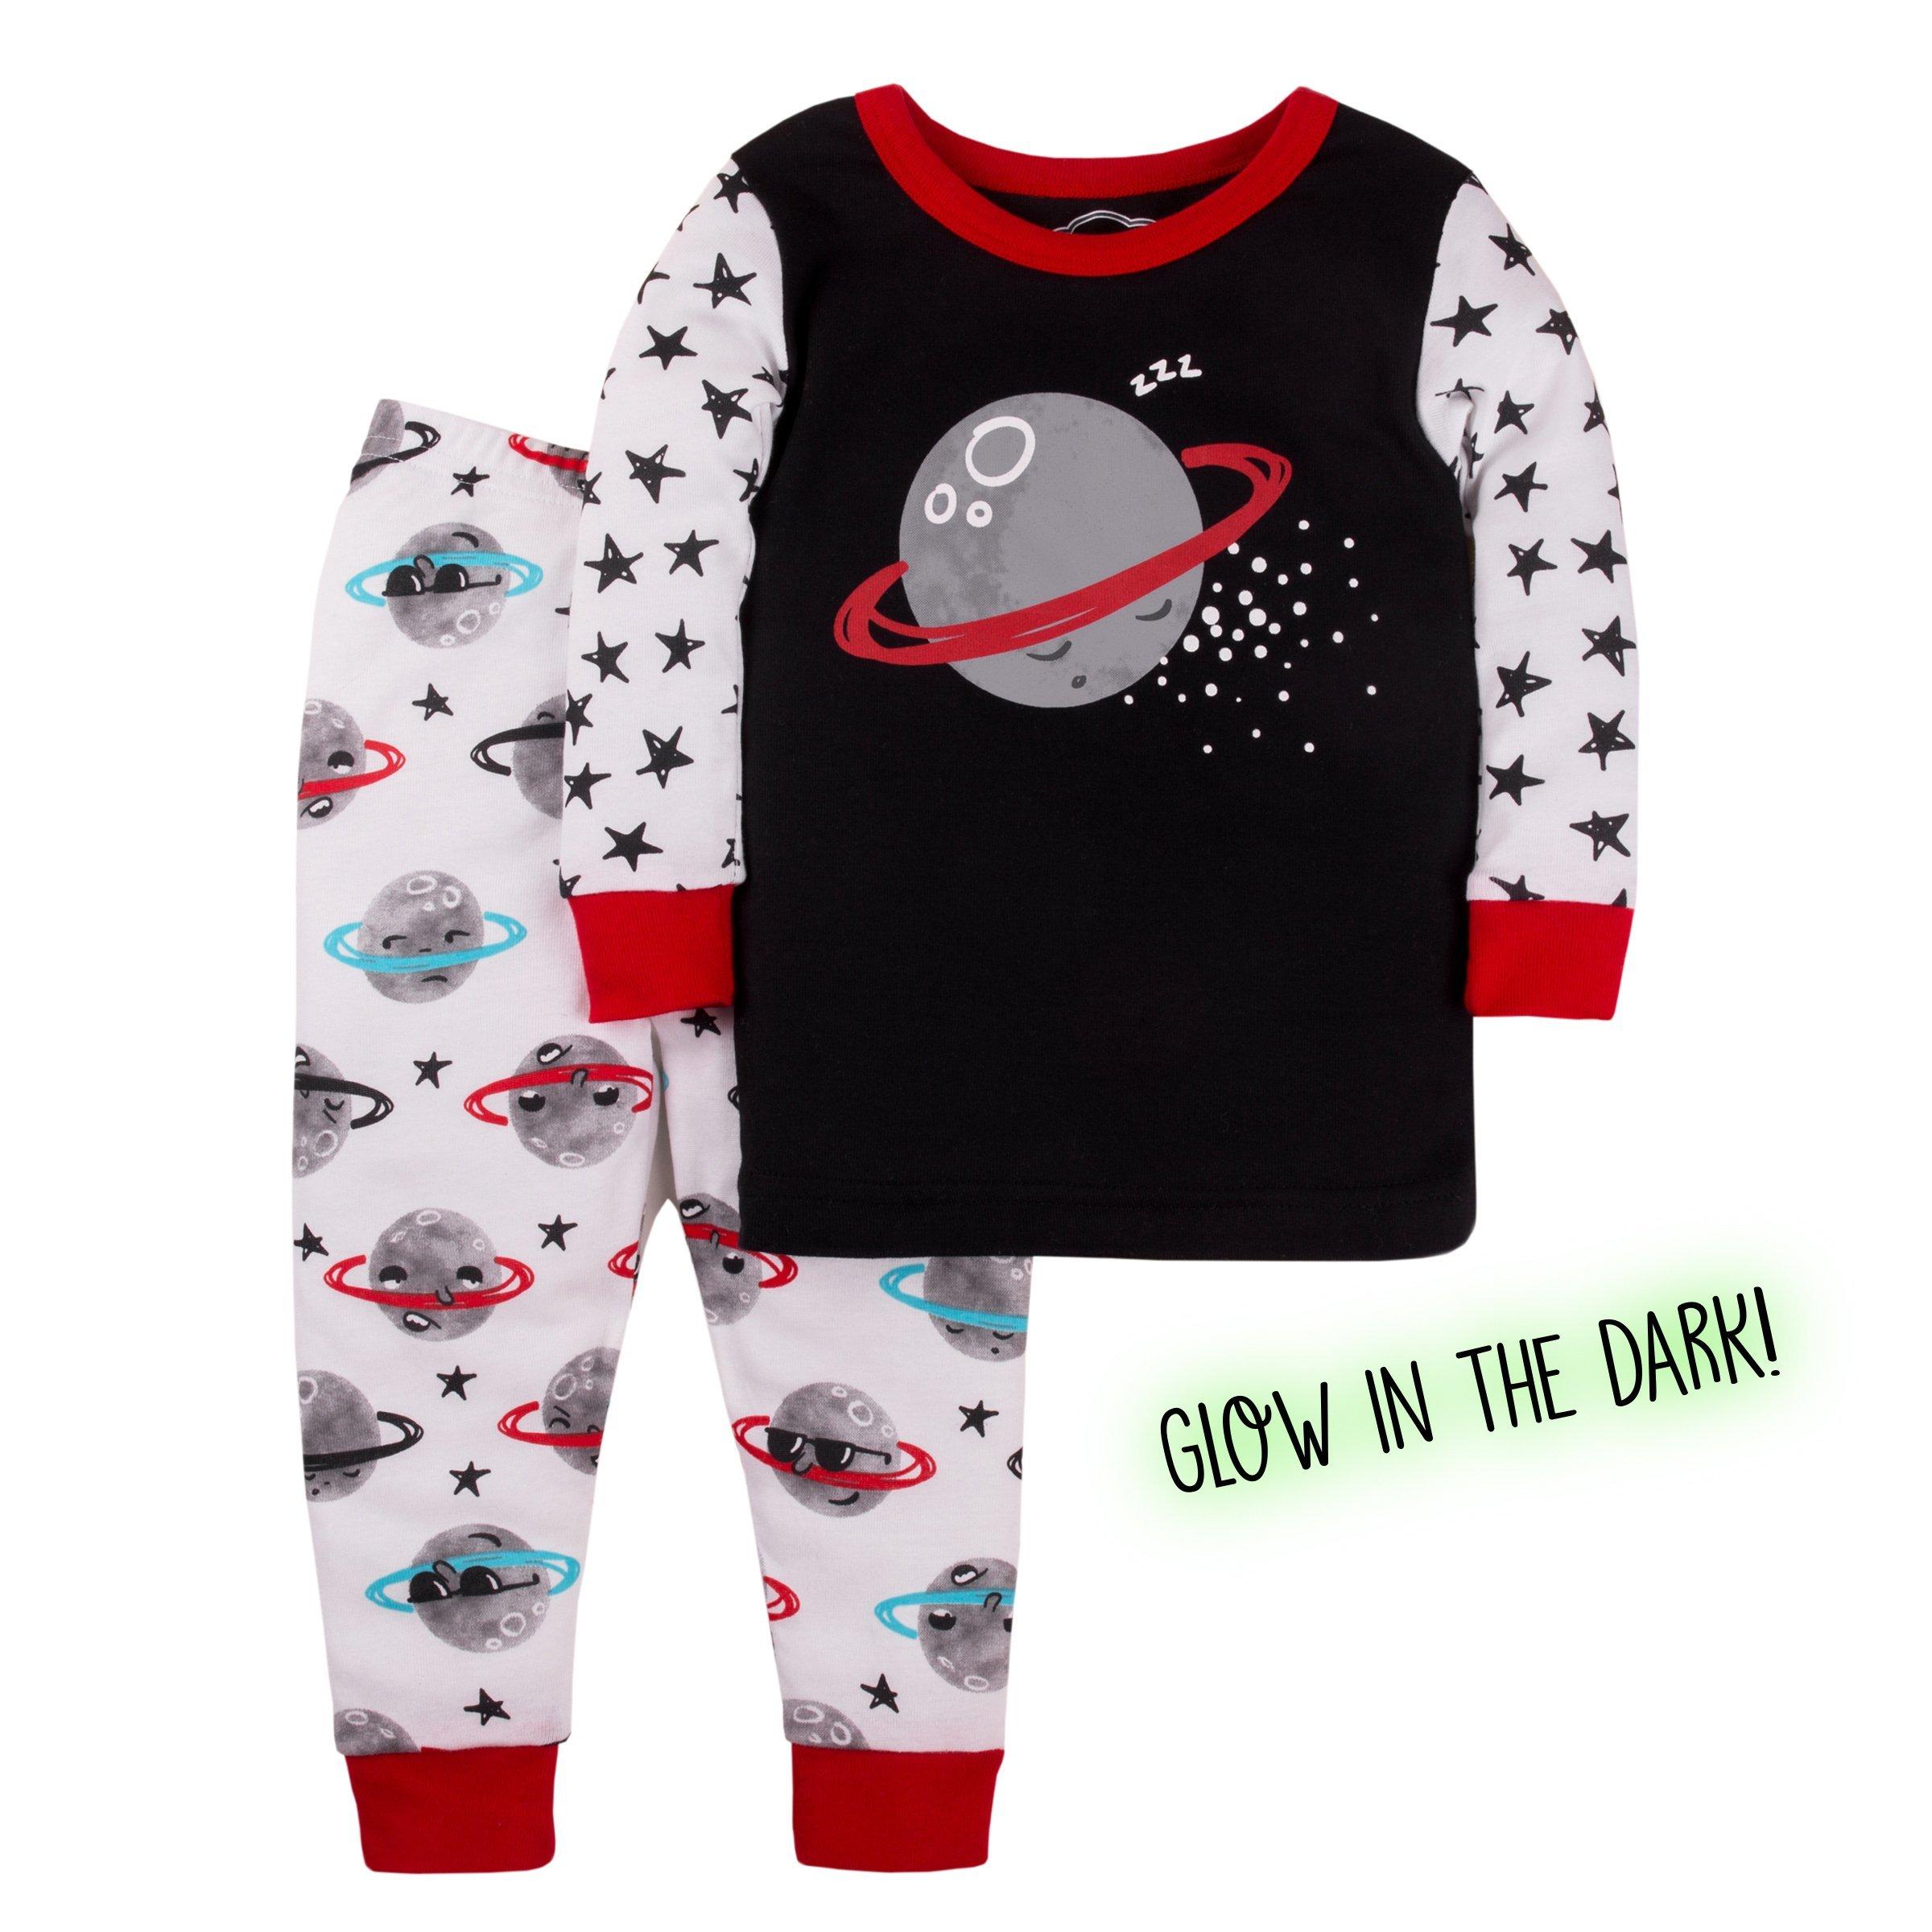 Lamaze Toddler Boys' Organic 2 Piece Longsleeve Tight Fit Pajamas Set, Black Moon, 3T